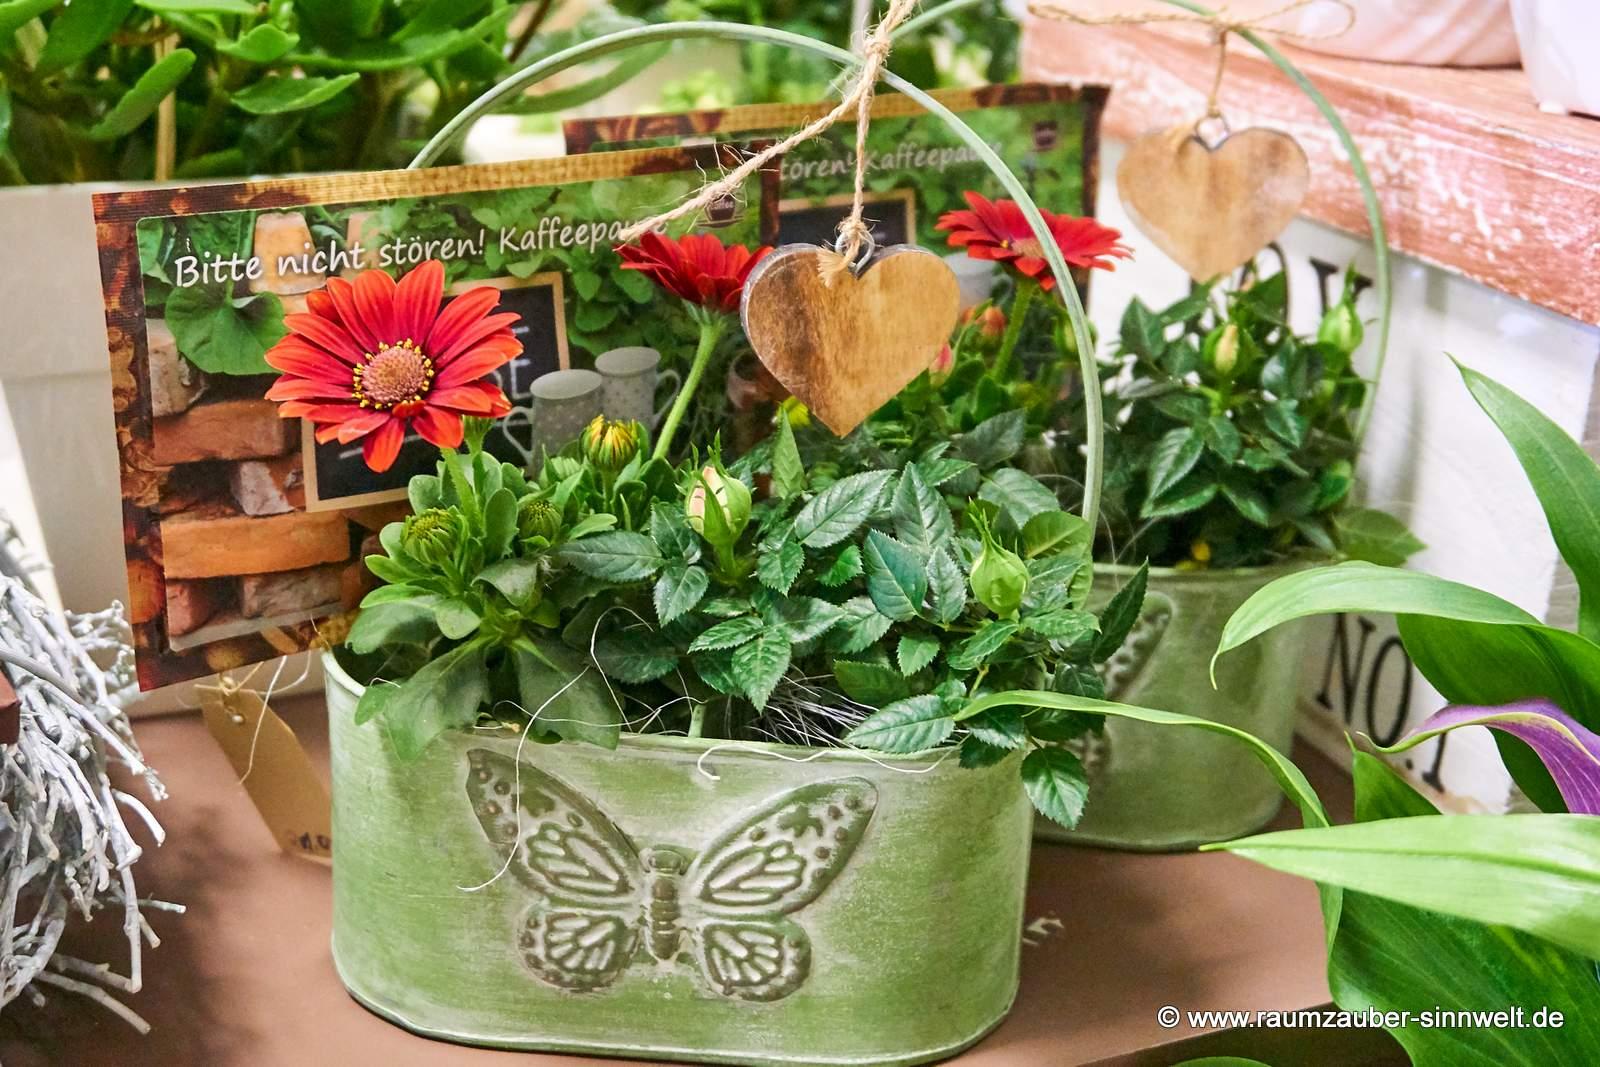 bunter Pflanzengruß mit Kaffeepostkarte